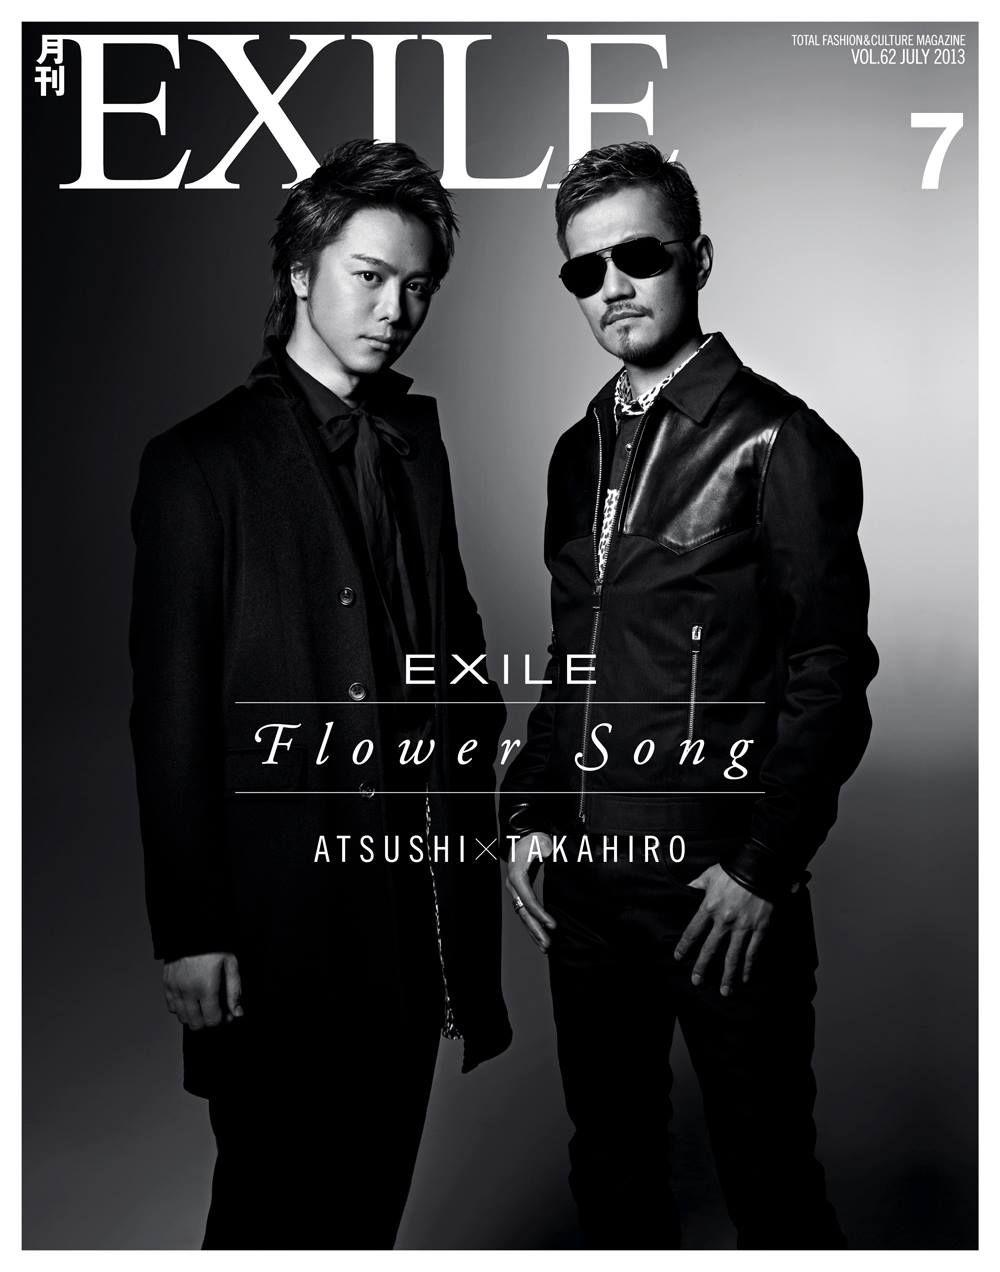 Exile Takahiro Atsushi アーティスト シェラック くぅ